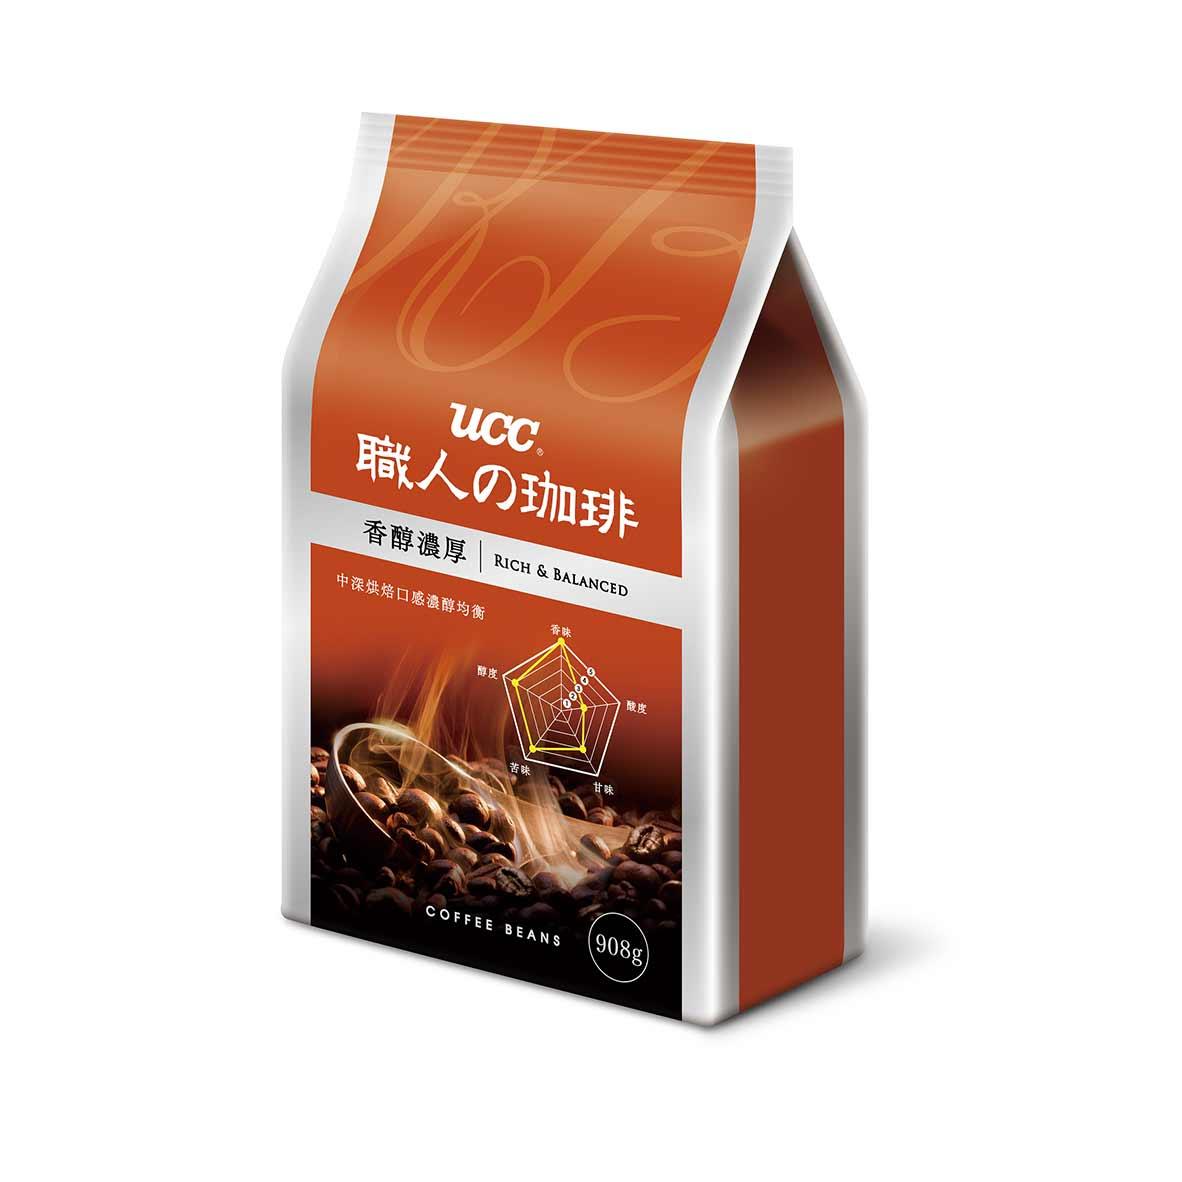 UCC職人の珈琲 香醇濃厚咖啡豆